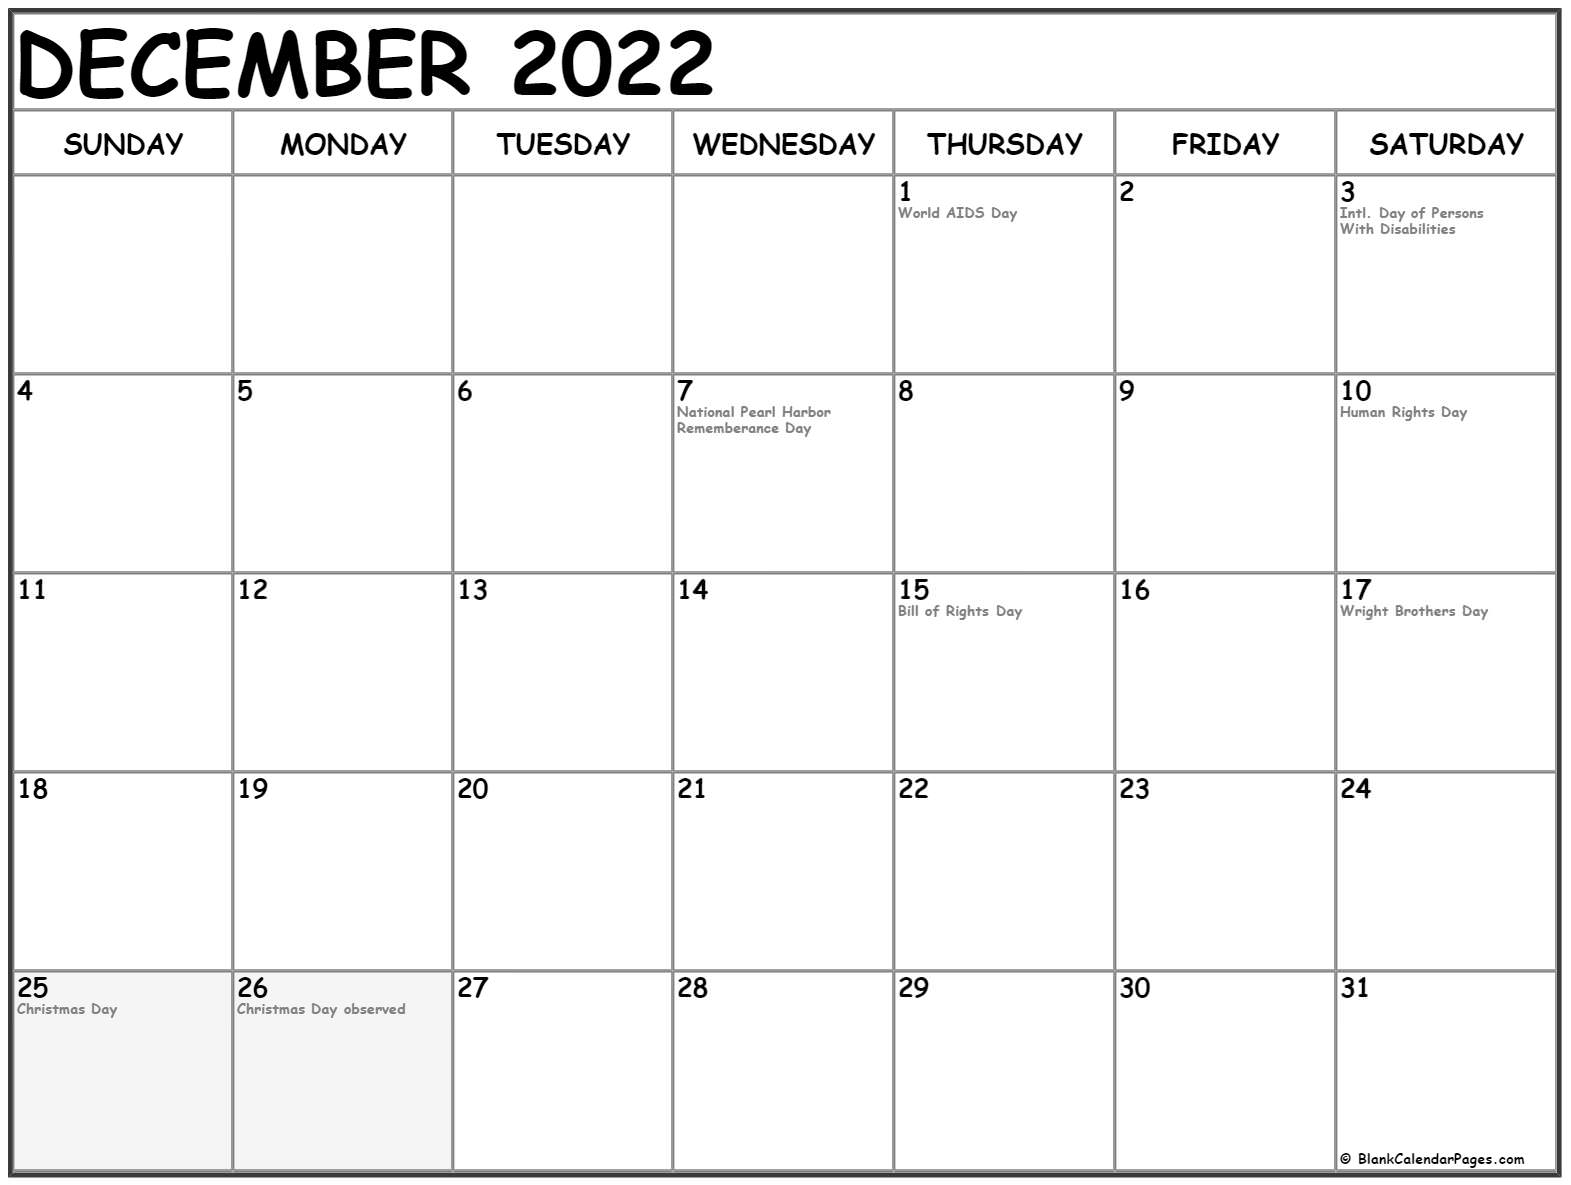 December 2018 calendar with USA holidays